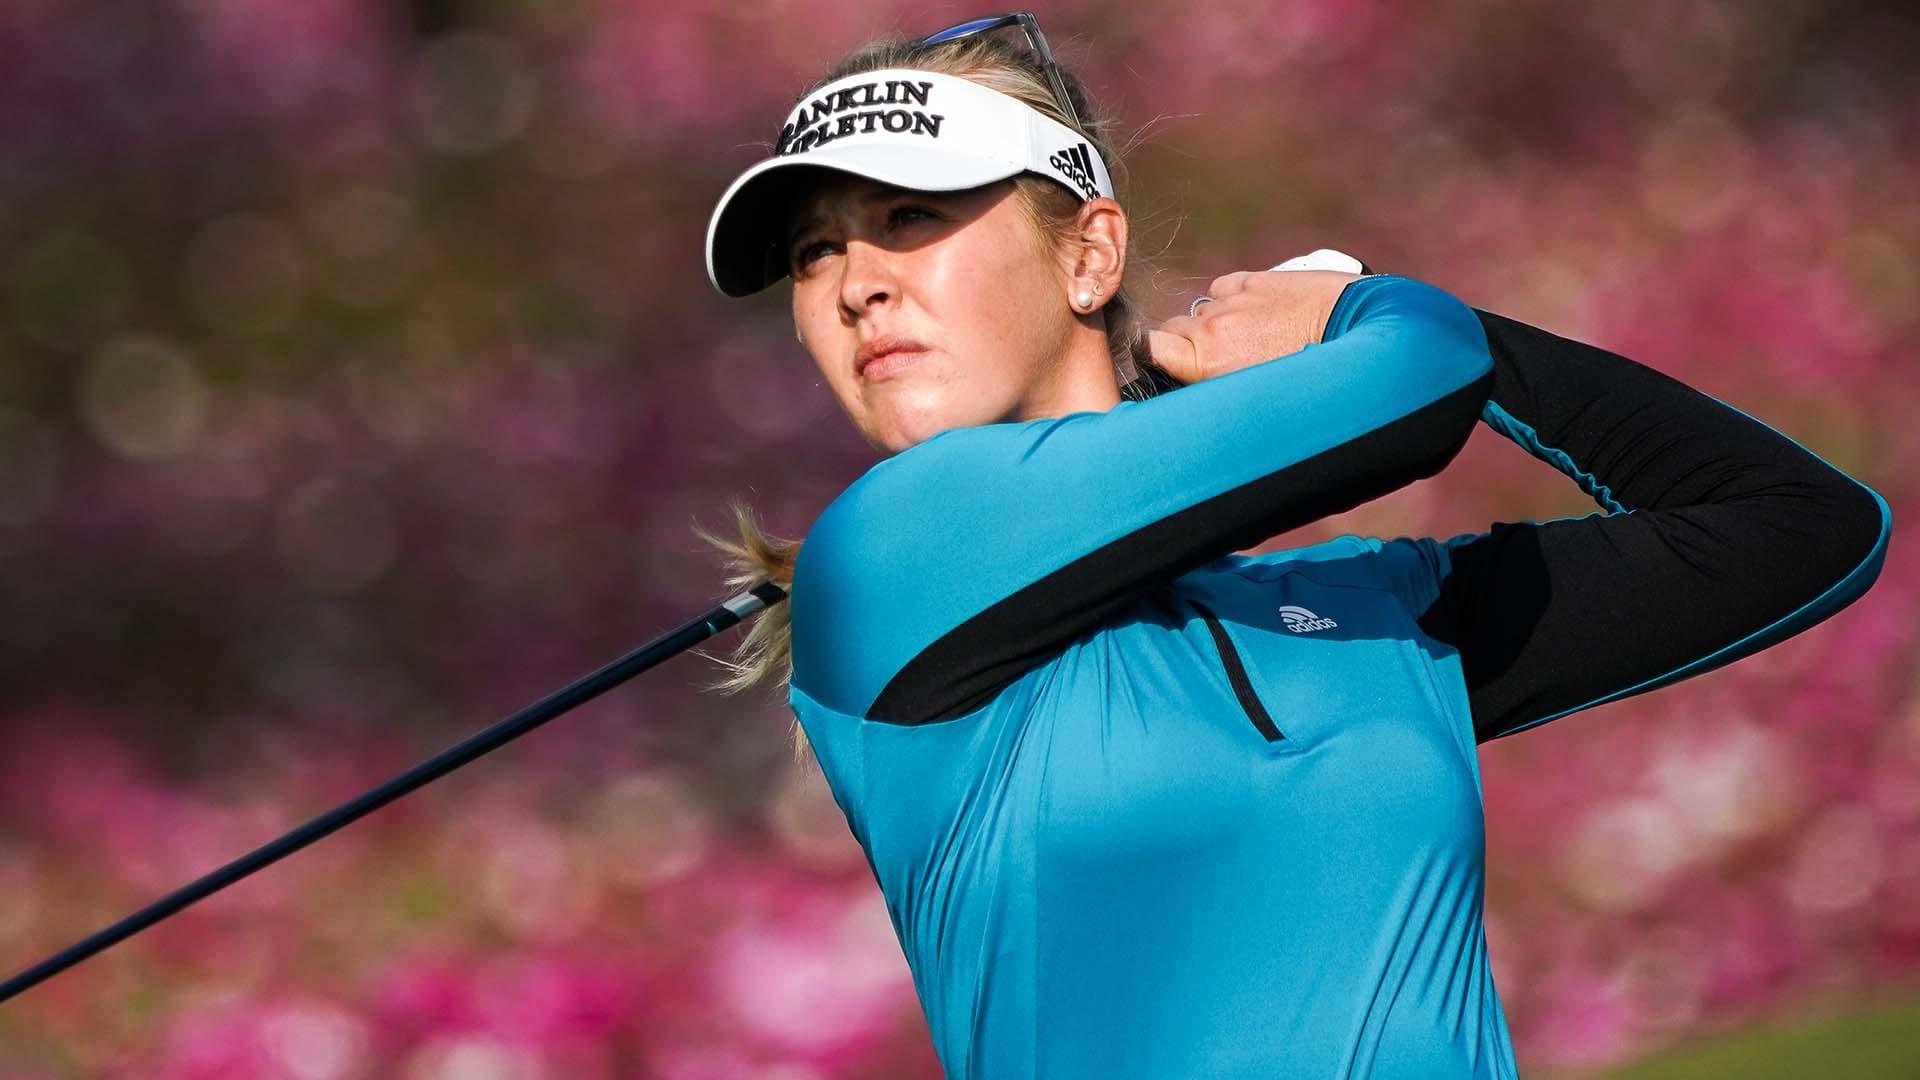 Jessica Korda (66) vaults into Shanghai lead; Brooke Henderson (73) slips |  Golf Channel